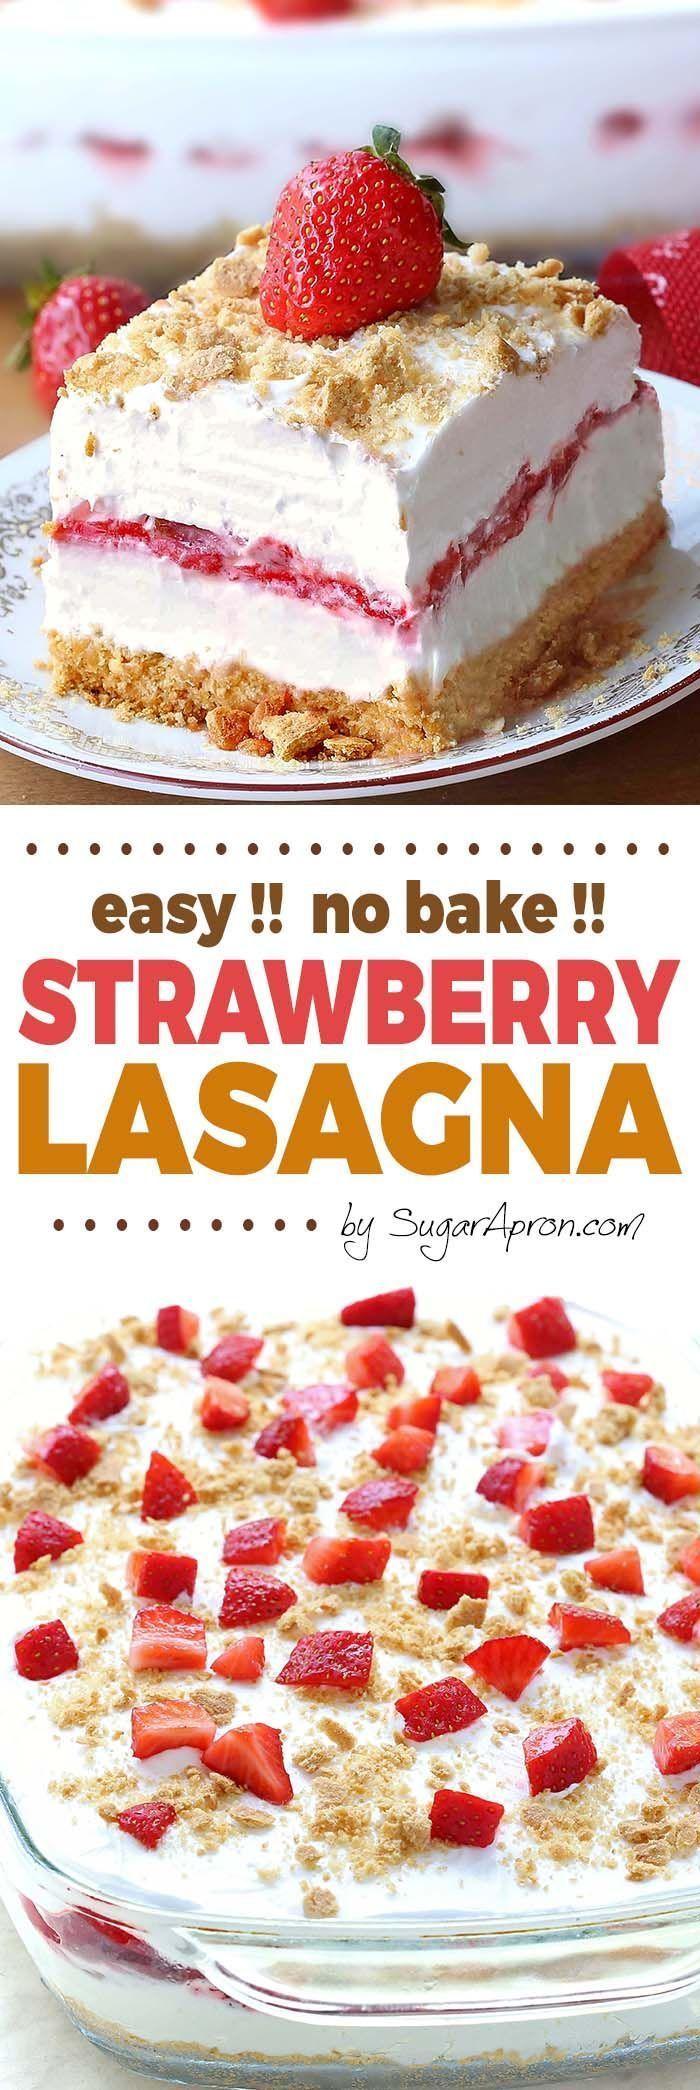 No Bake Strawberry Cheesecake Lasagna -   12 desserts Strawberry stevia ideas